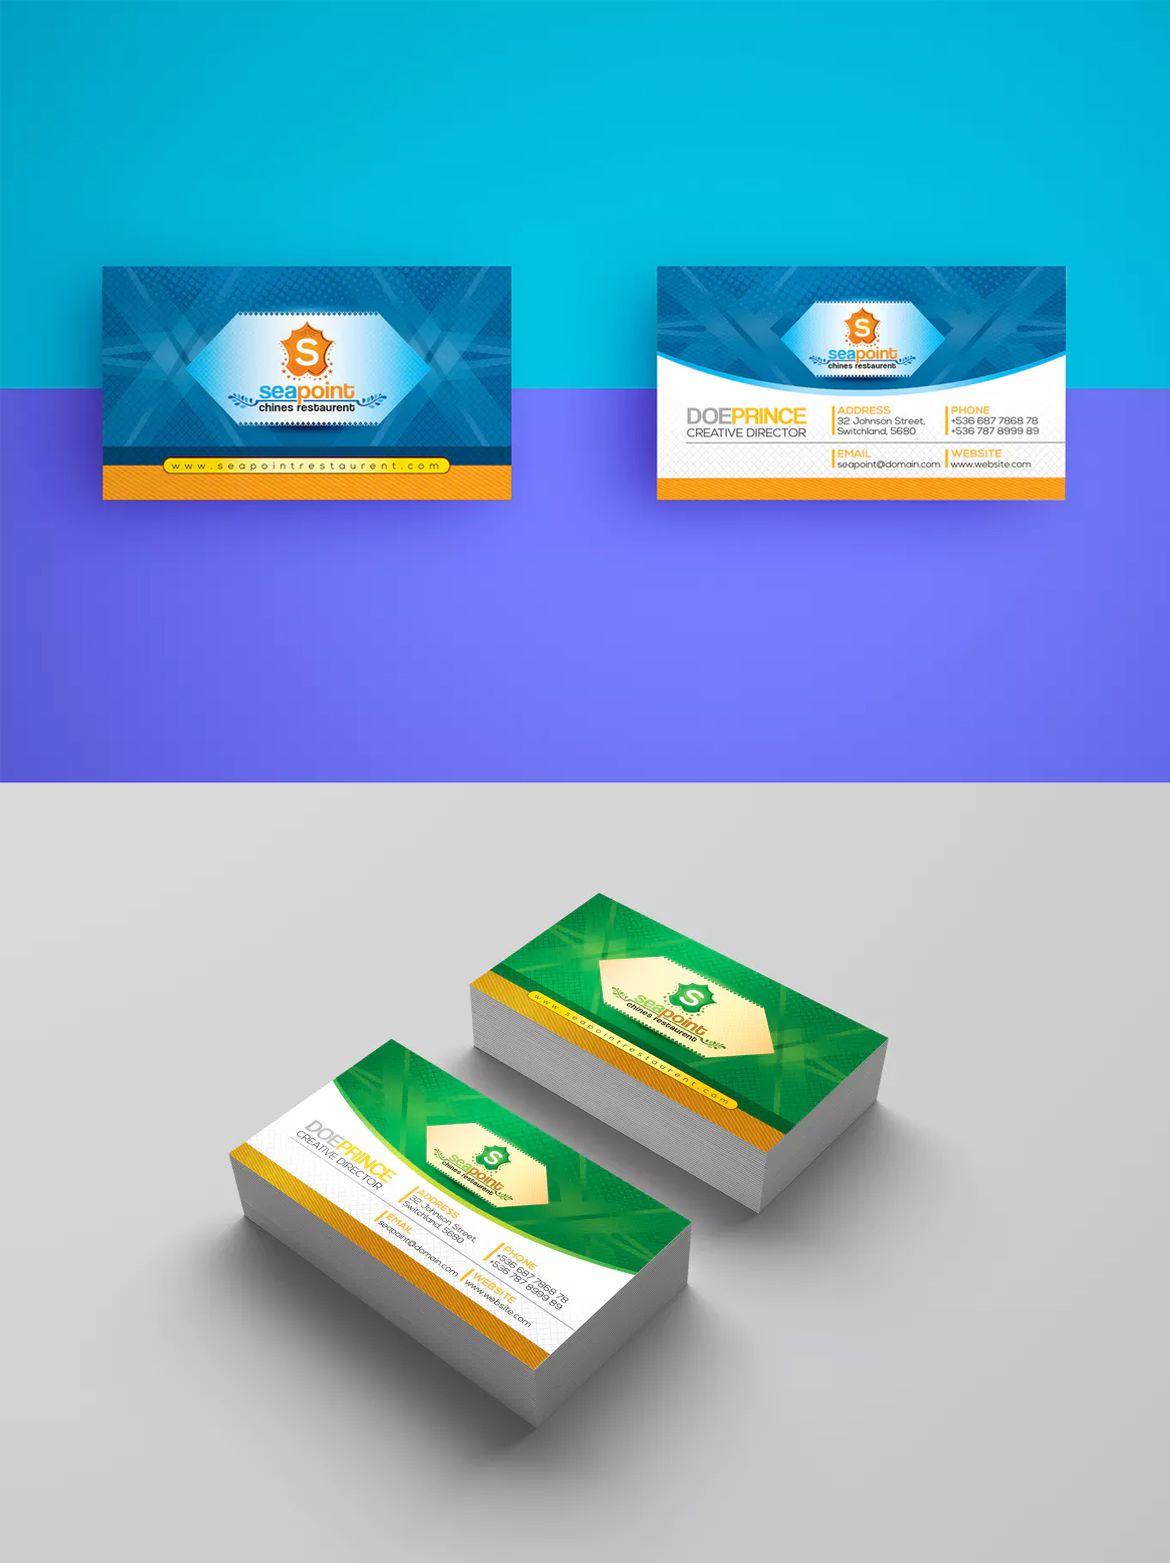 Vintage style business card design template ai eps business card vintage style business card design template ai eps wajeb Image collections